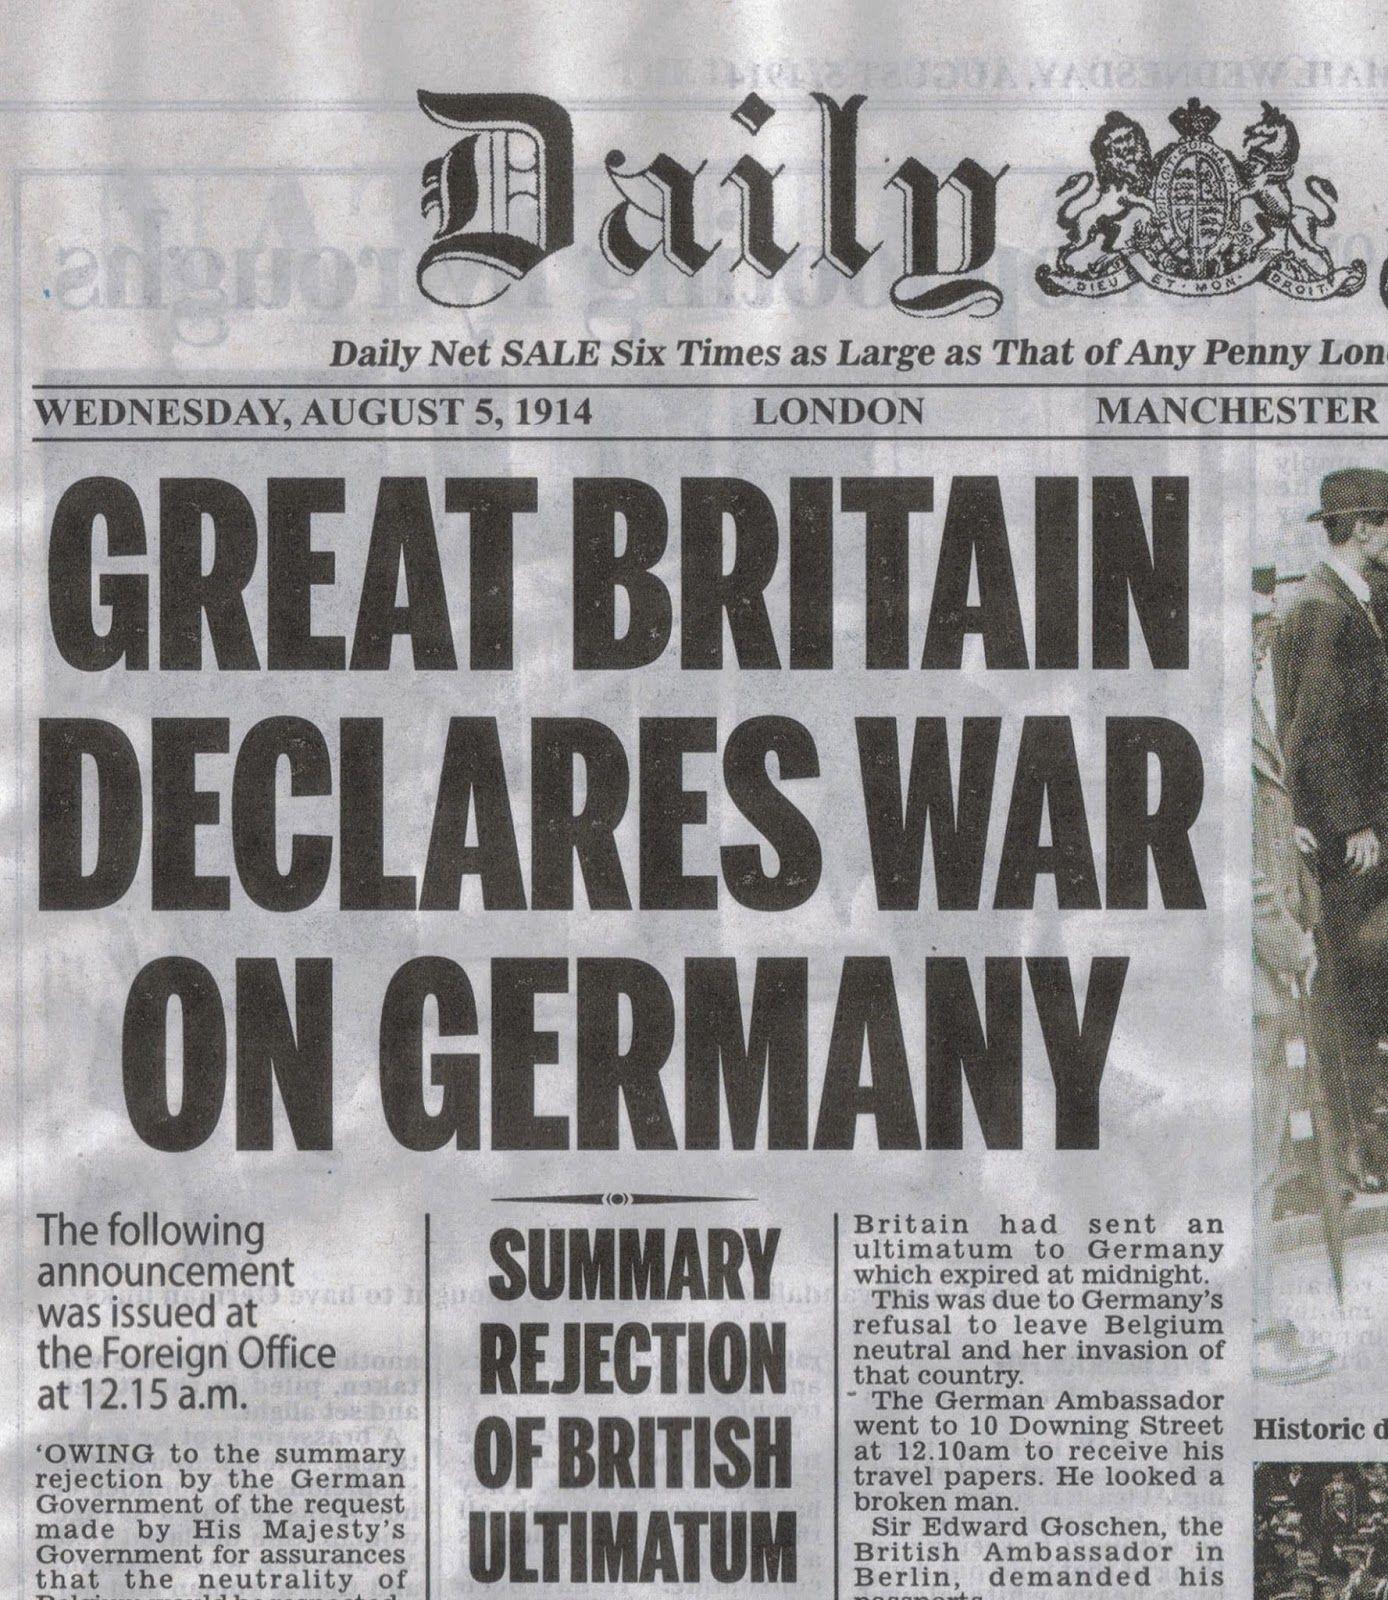 1914 Adverts At The Start Of World War I #1914 #adverts #worldwar1 ...